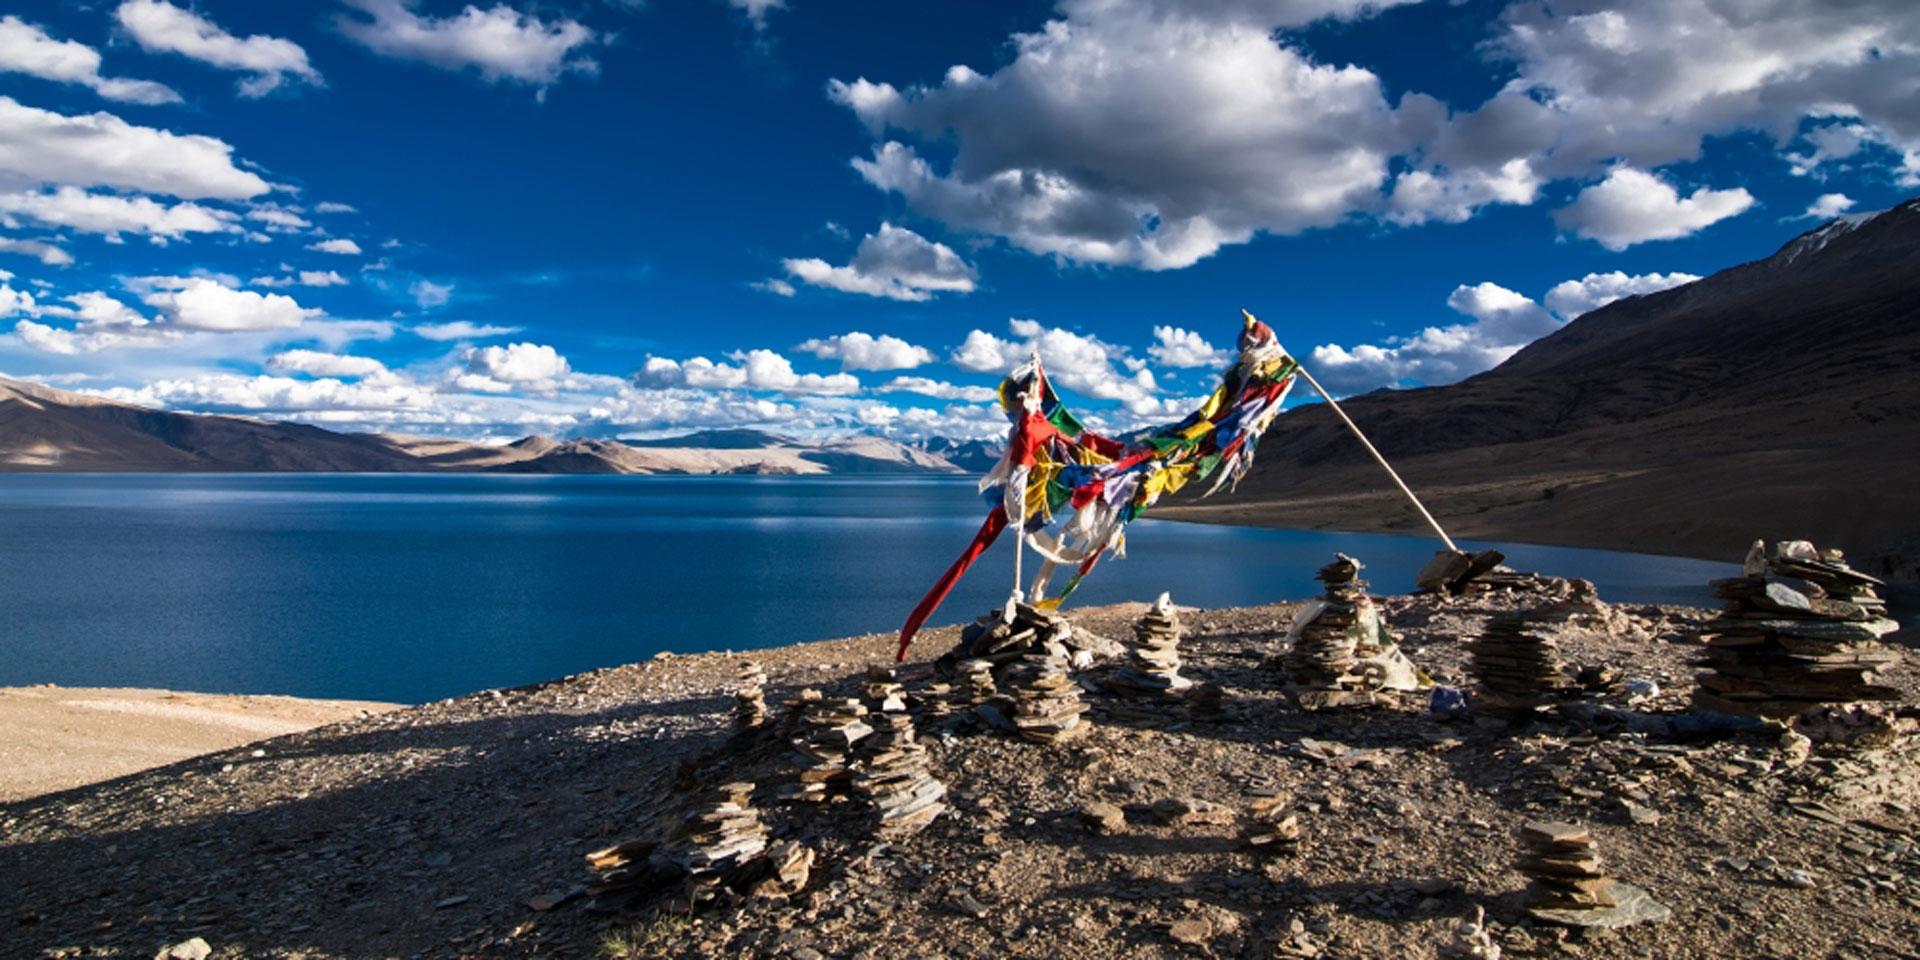 Remote Lands' Dozen Dream Destinations for 2015